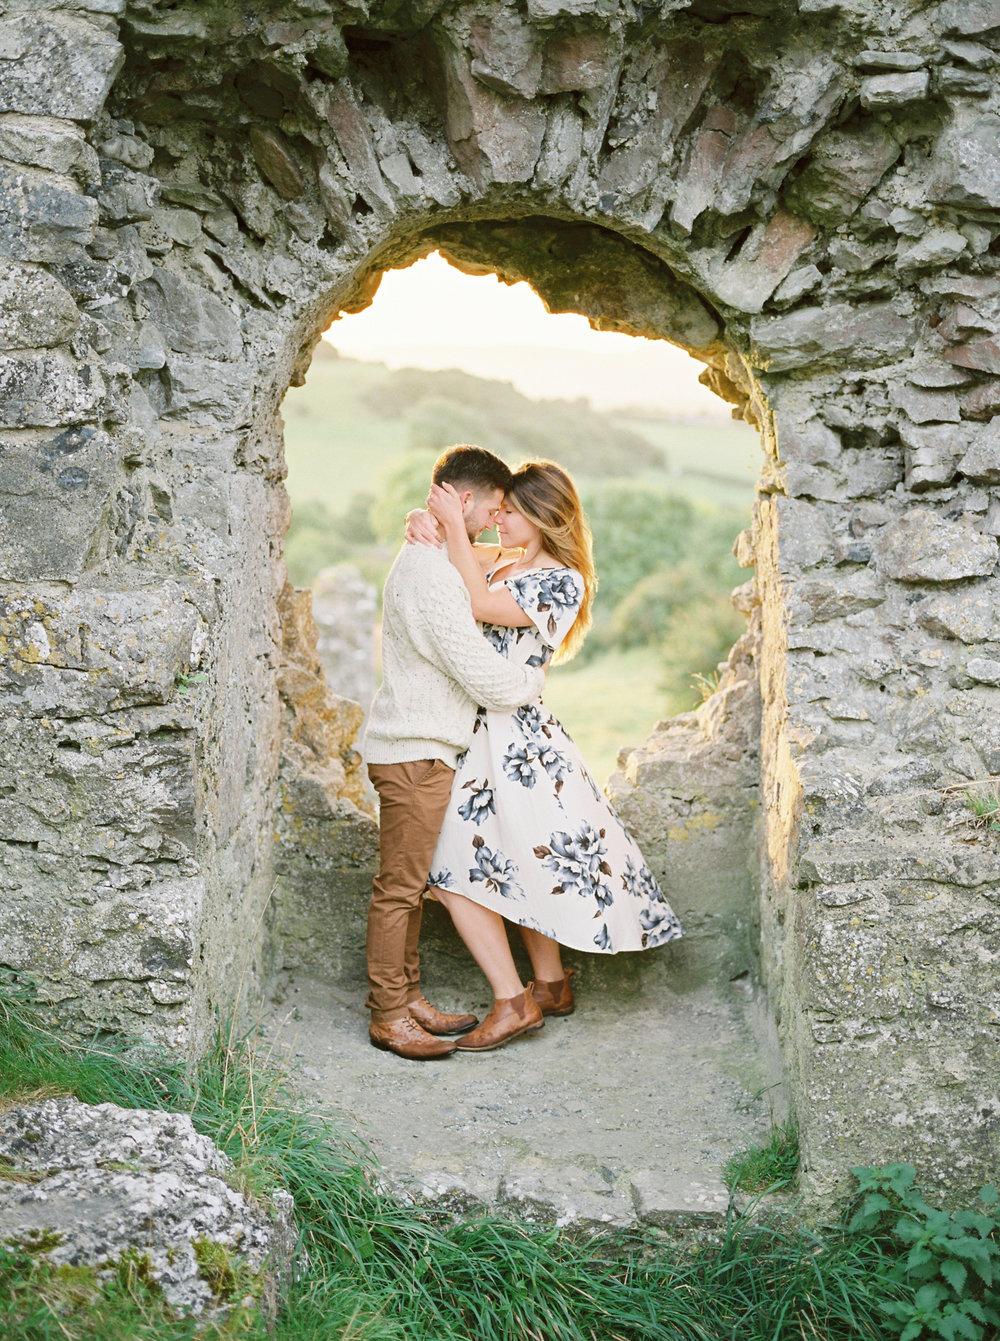 honeymoon session in ireland